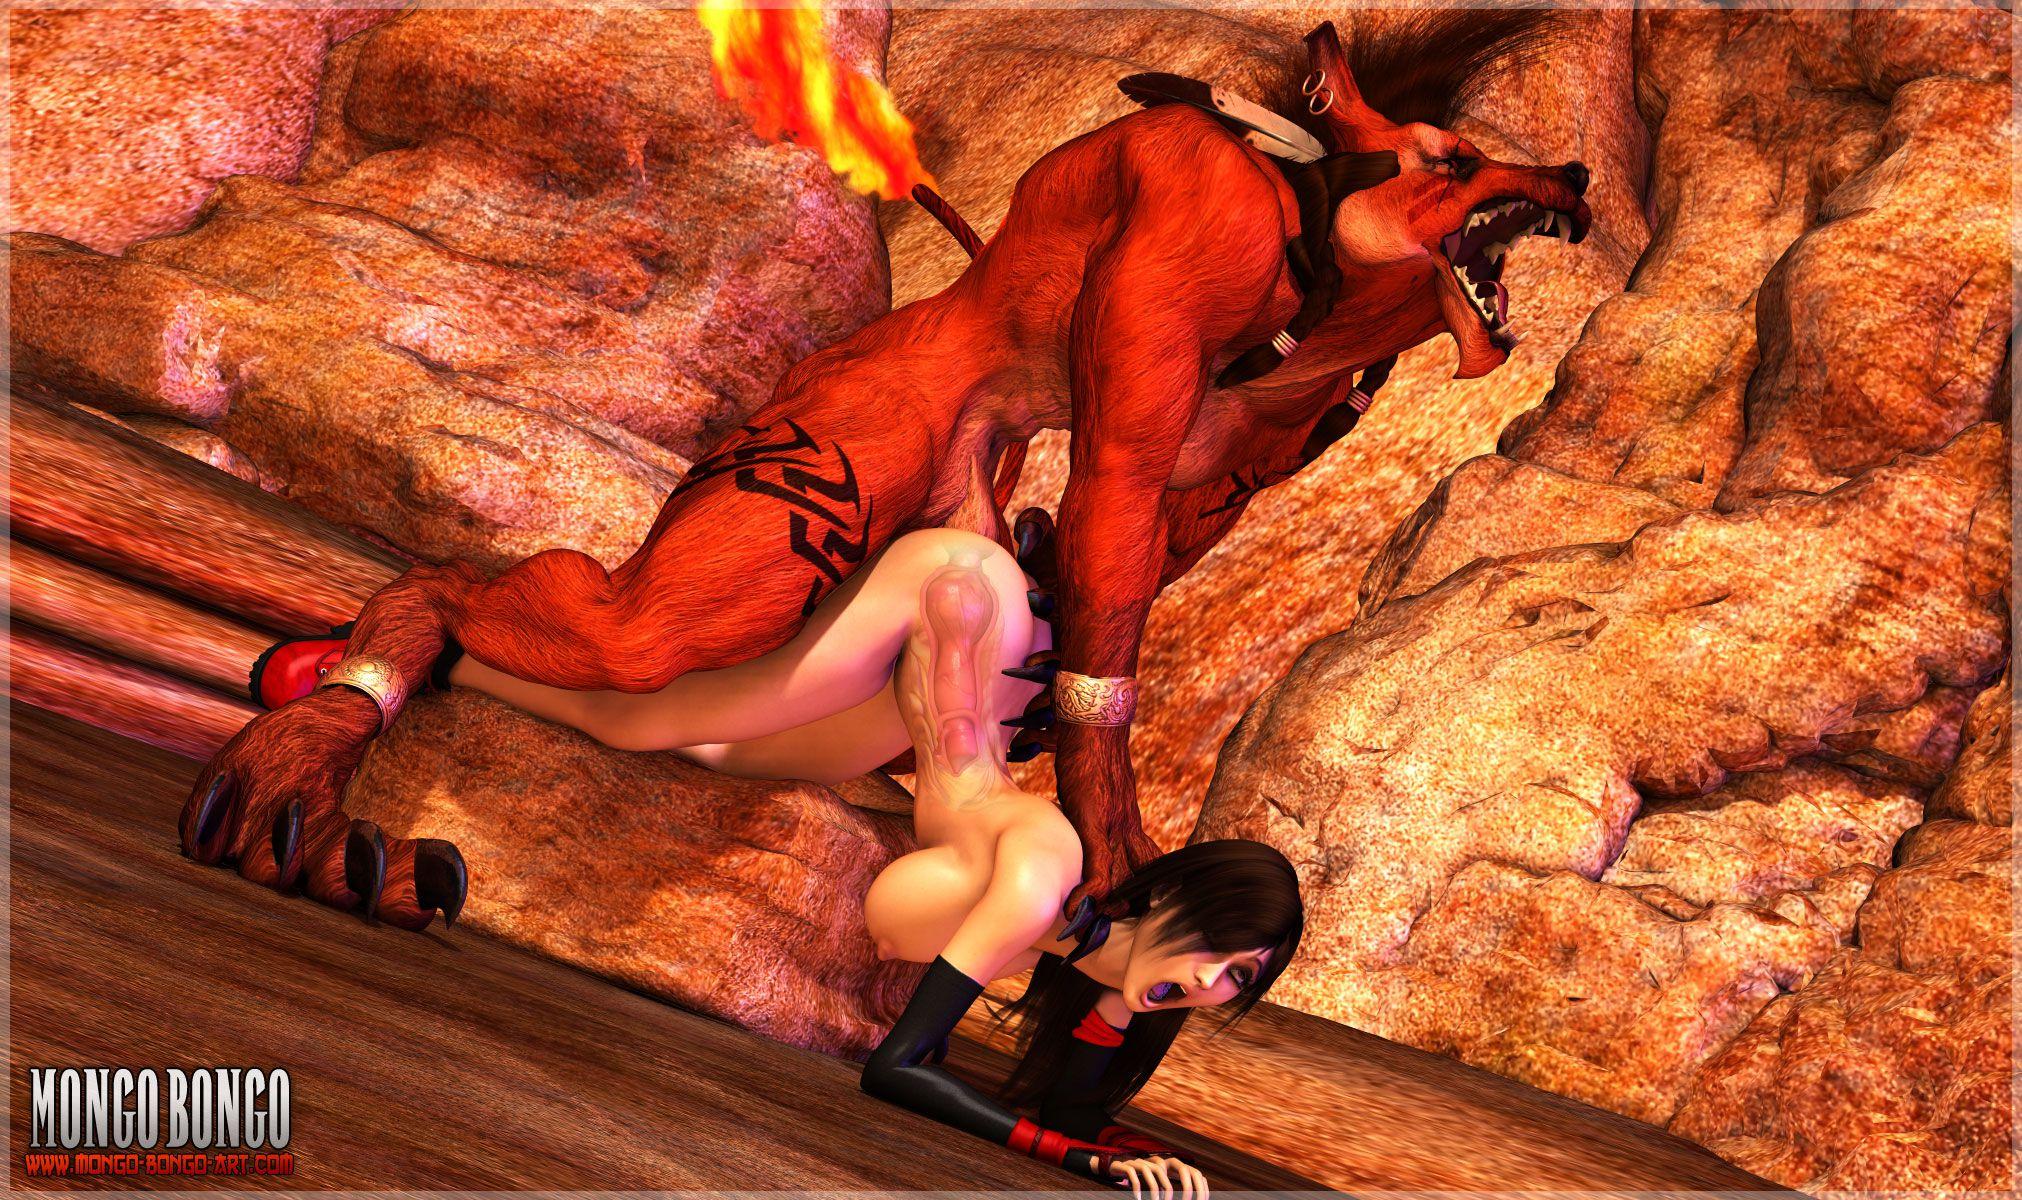 Photo big tarma 3d erotic images